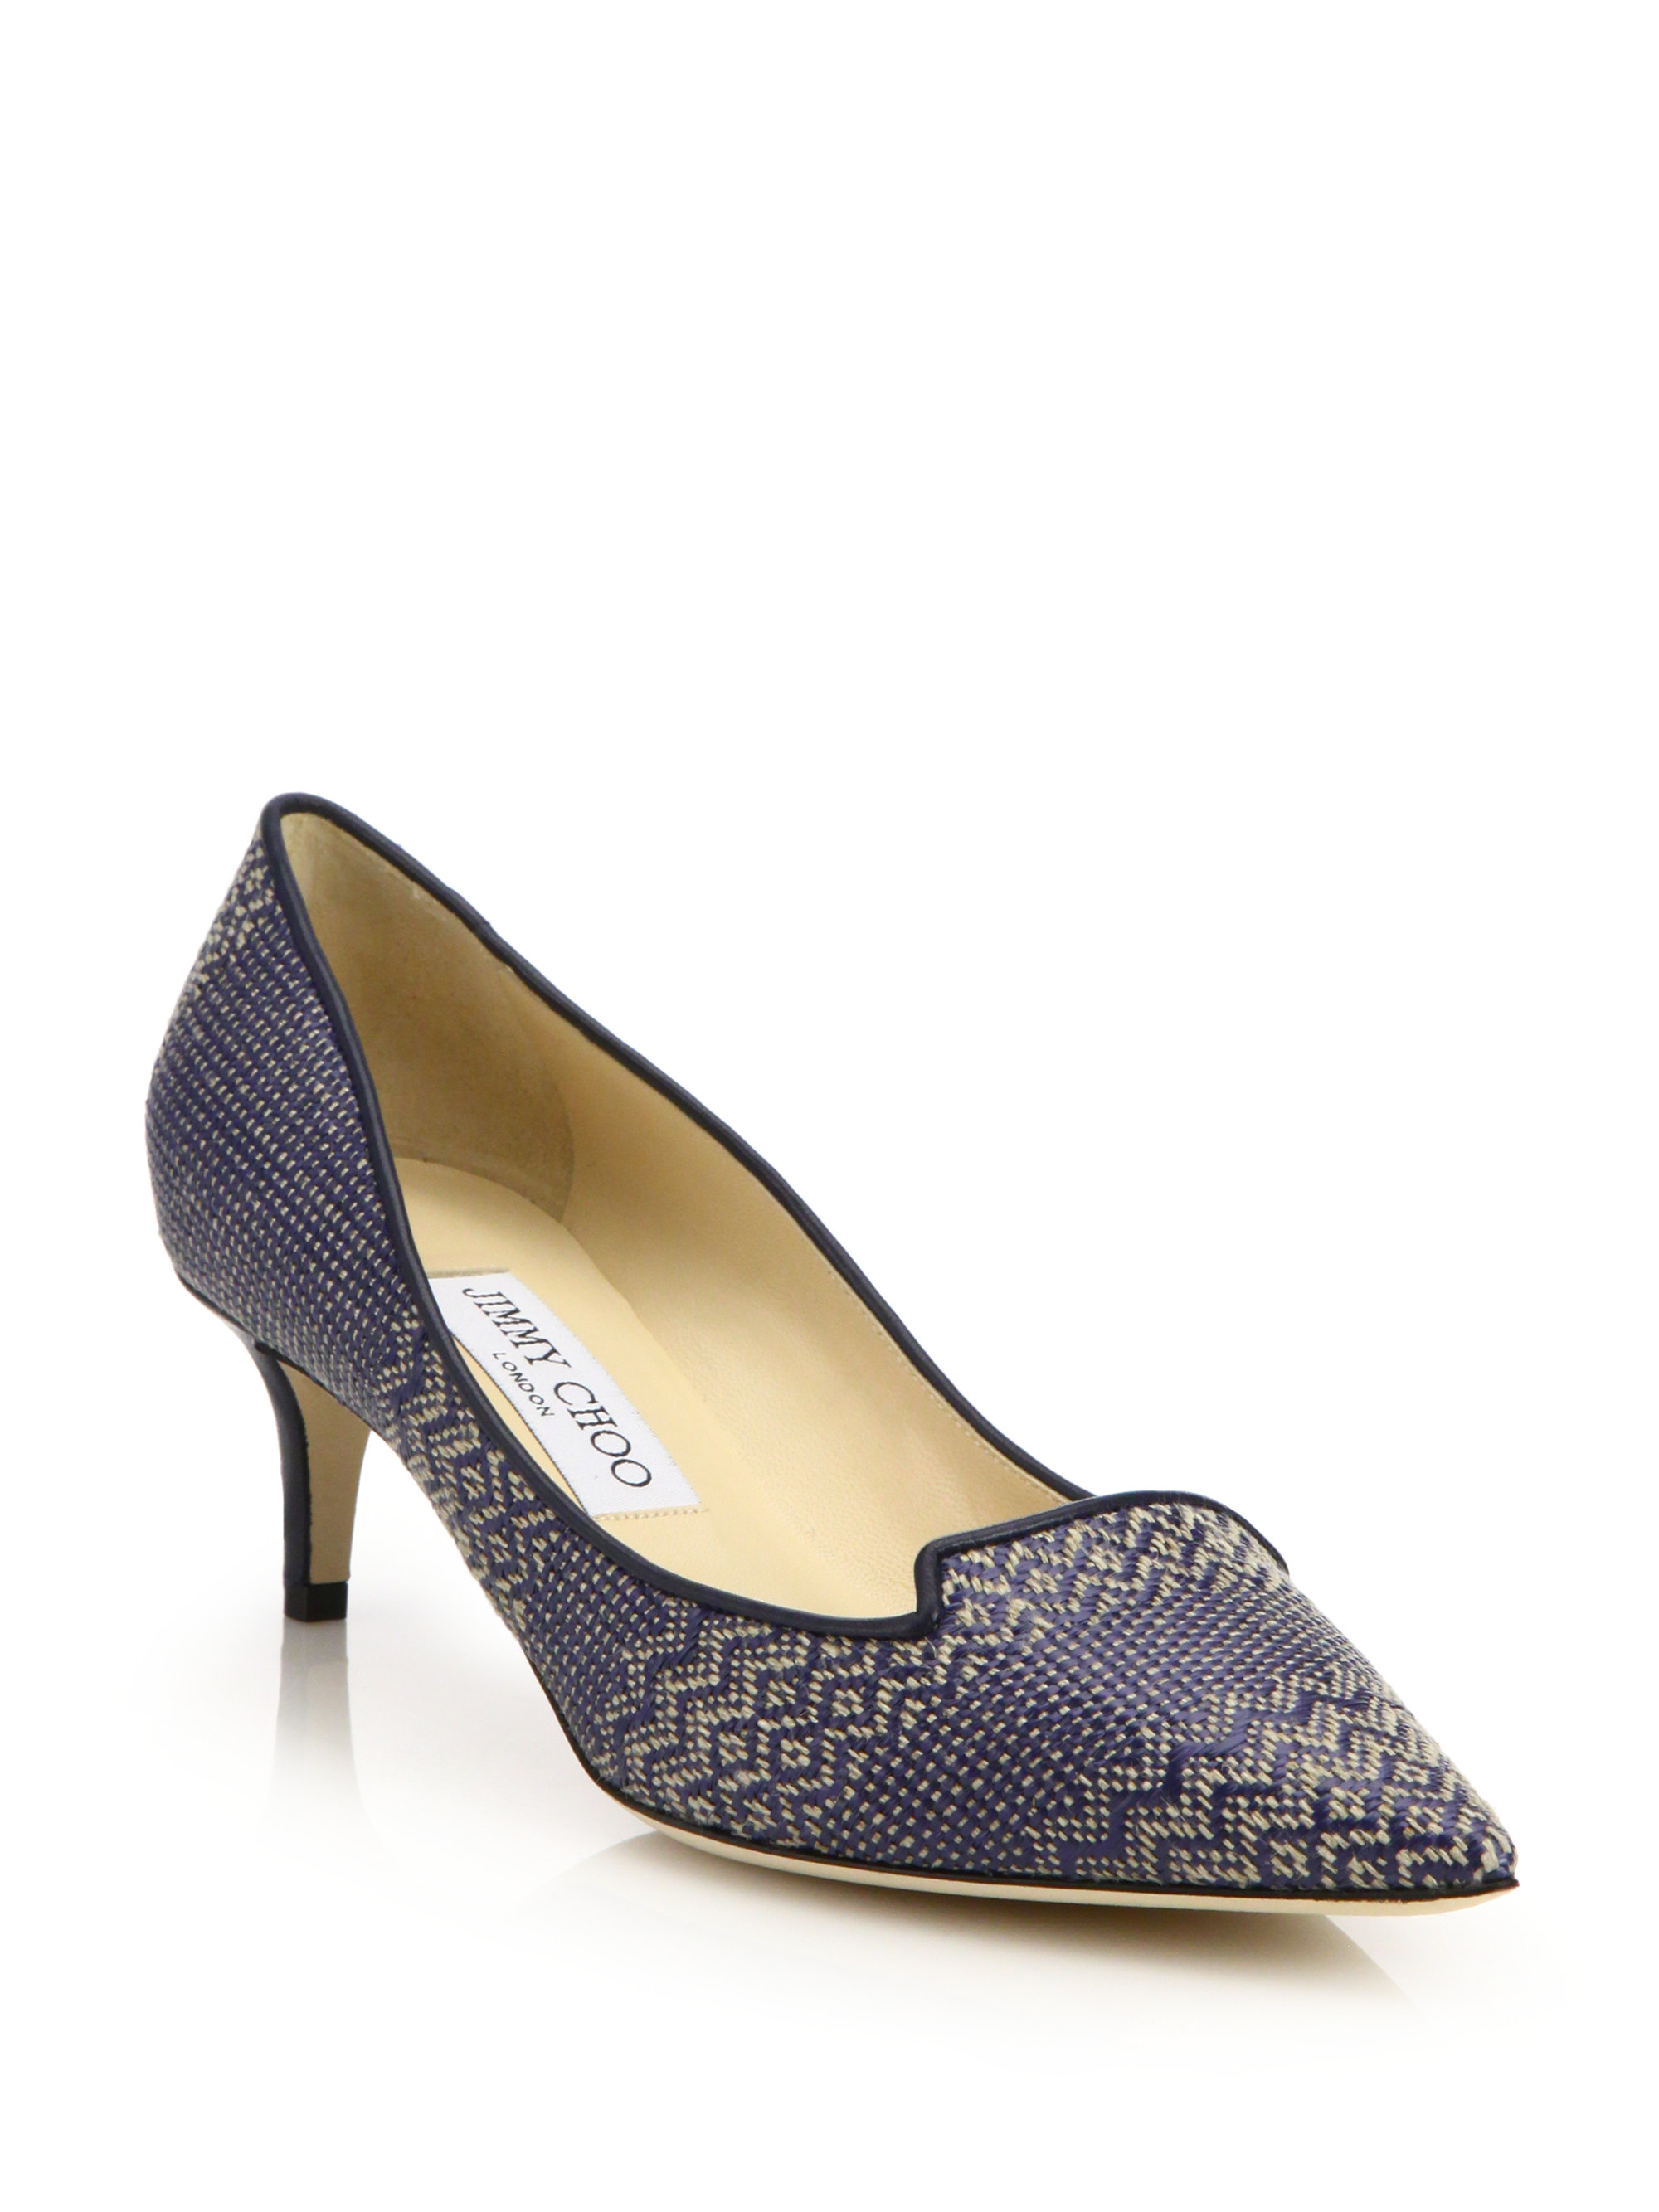 cc79d4054383 ... low cost lyst jimmy choo allure 50 woven textile leather mid heel pumps  2da51 9e1fe